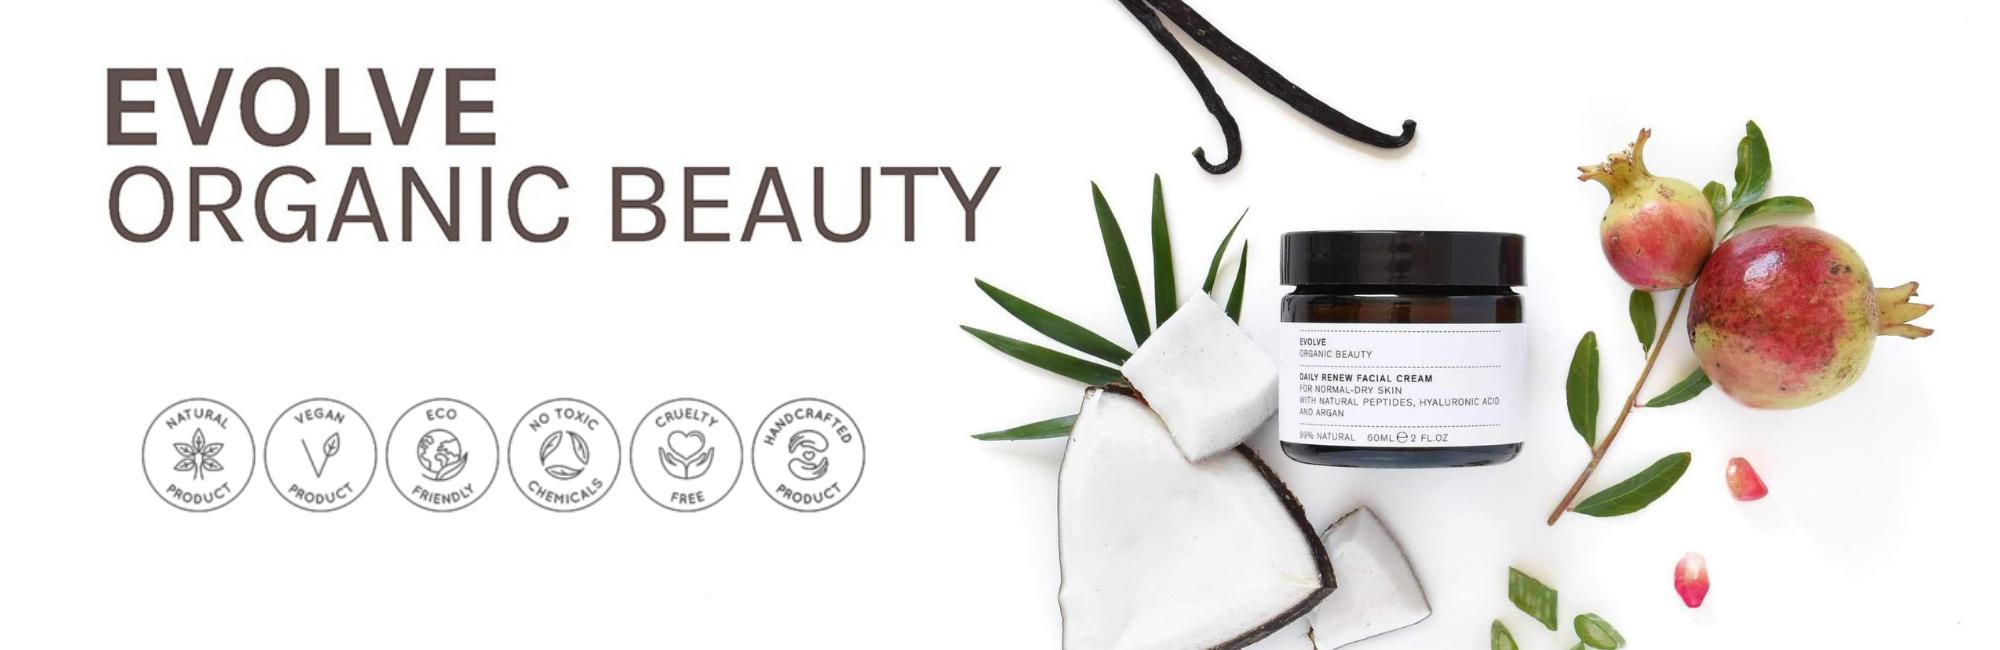 Evolve Beauty  - Organic Skincare